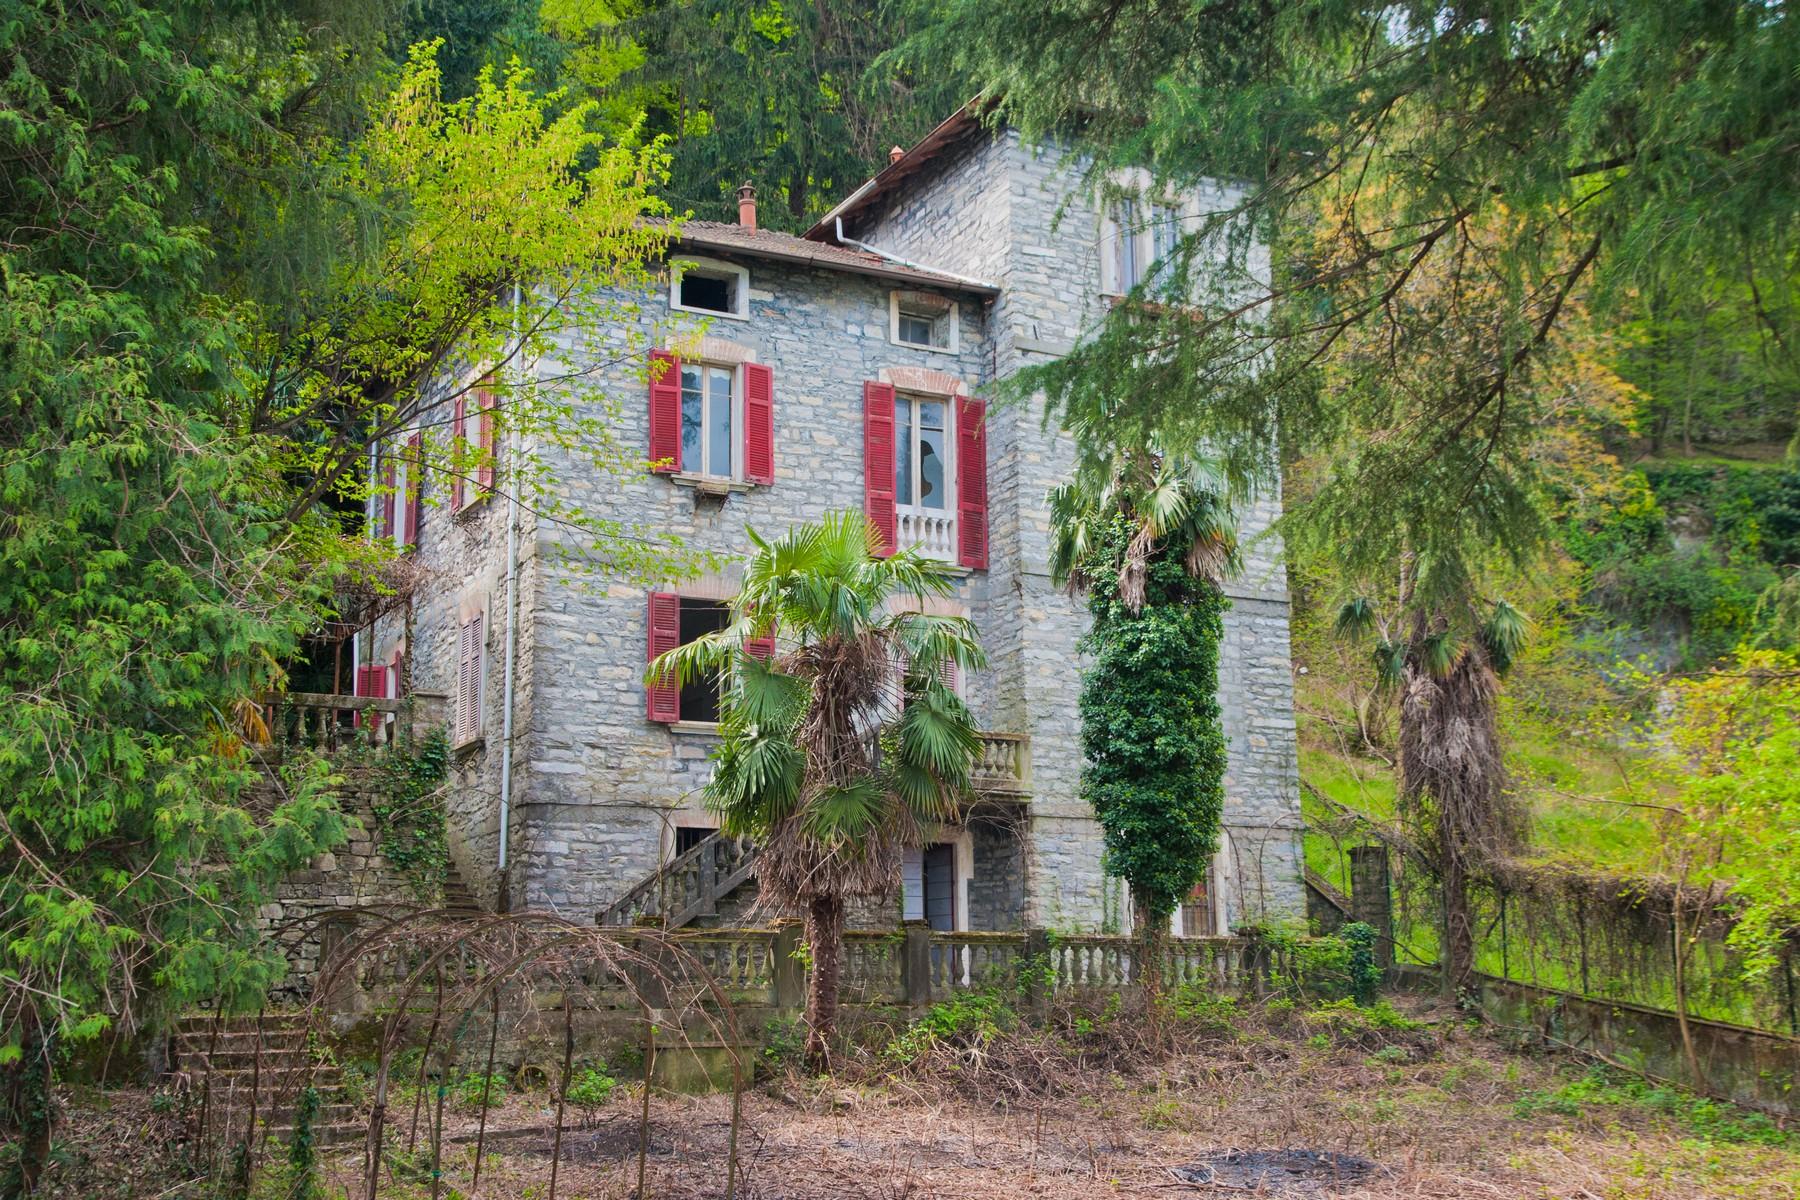 Villa in Vendita a Torno via pliniana